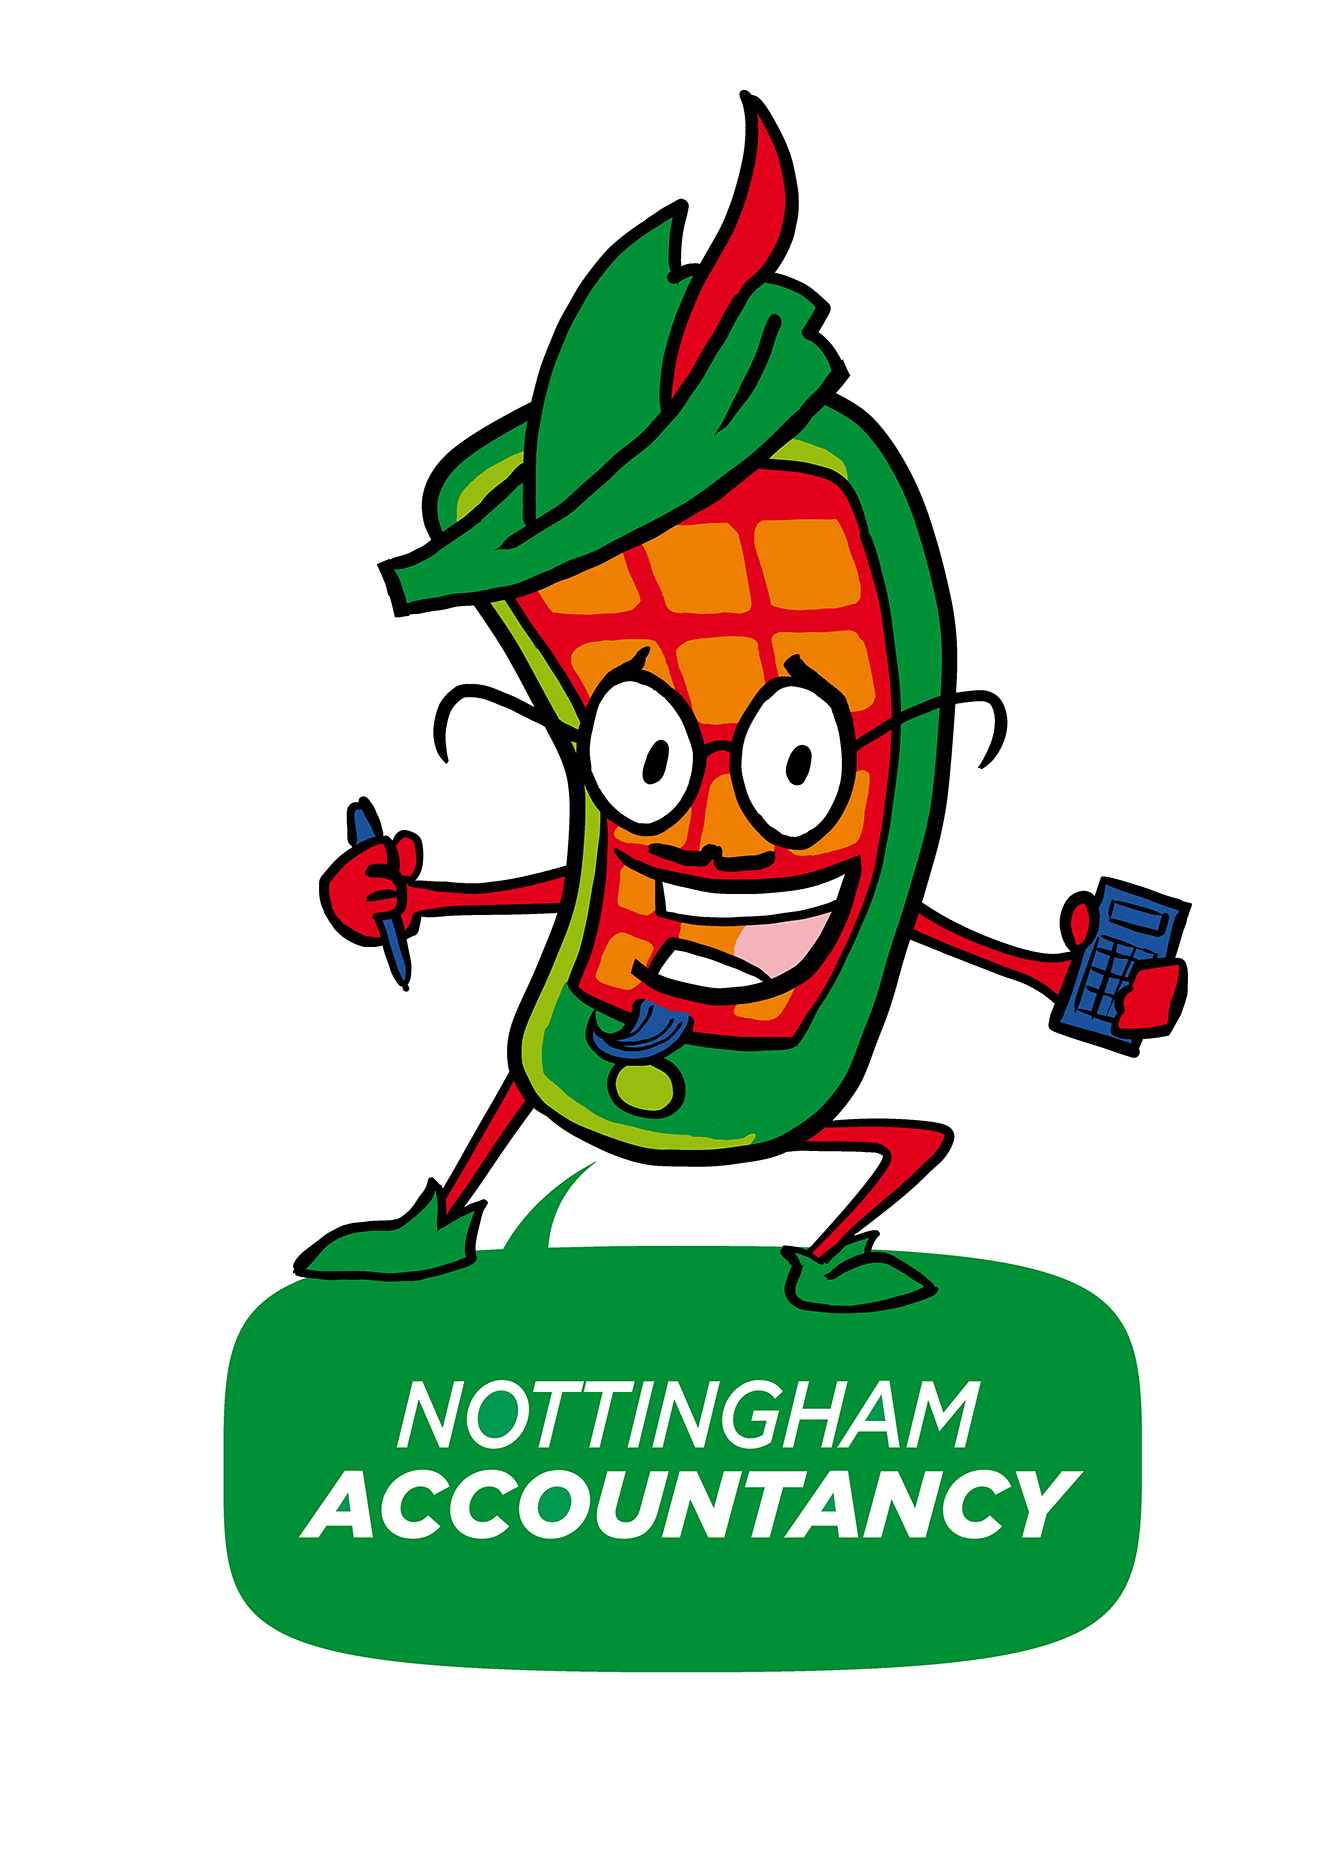 Nottingham Accountancy